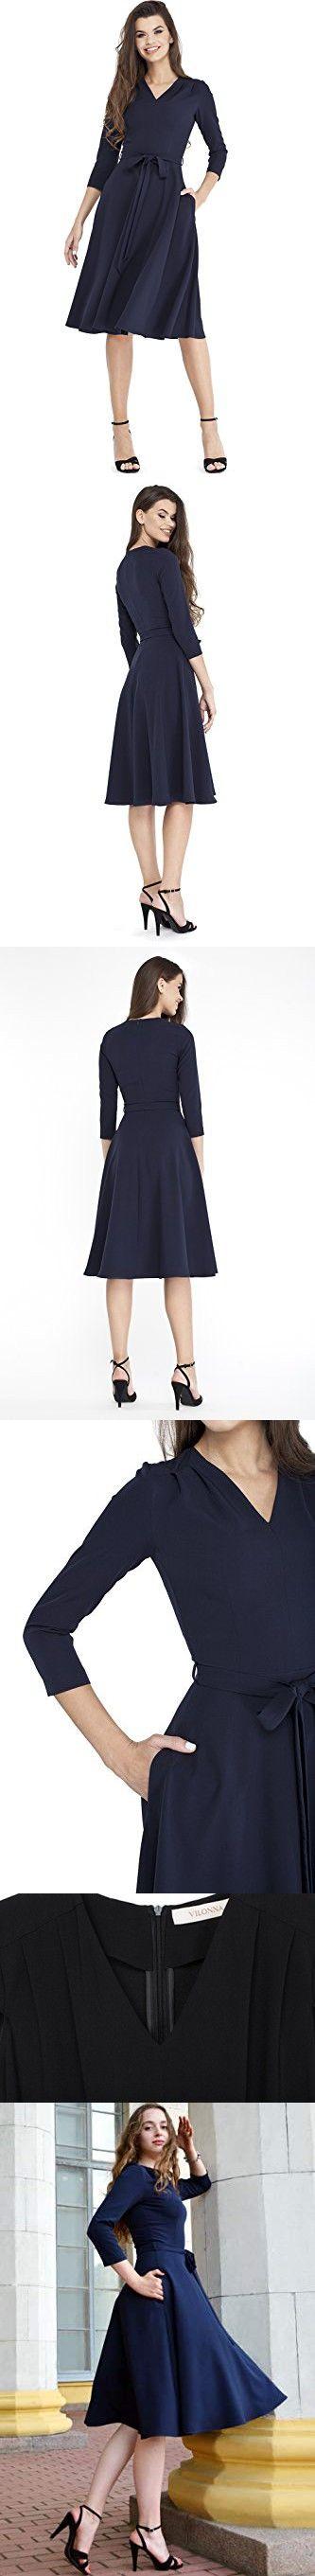 09df5b96065 VILONNA Women s Elegant Modest 3 4 Sleeve V Neck Belted Semi Formal Midi  Dress with Pockets